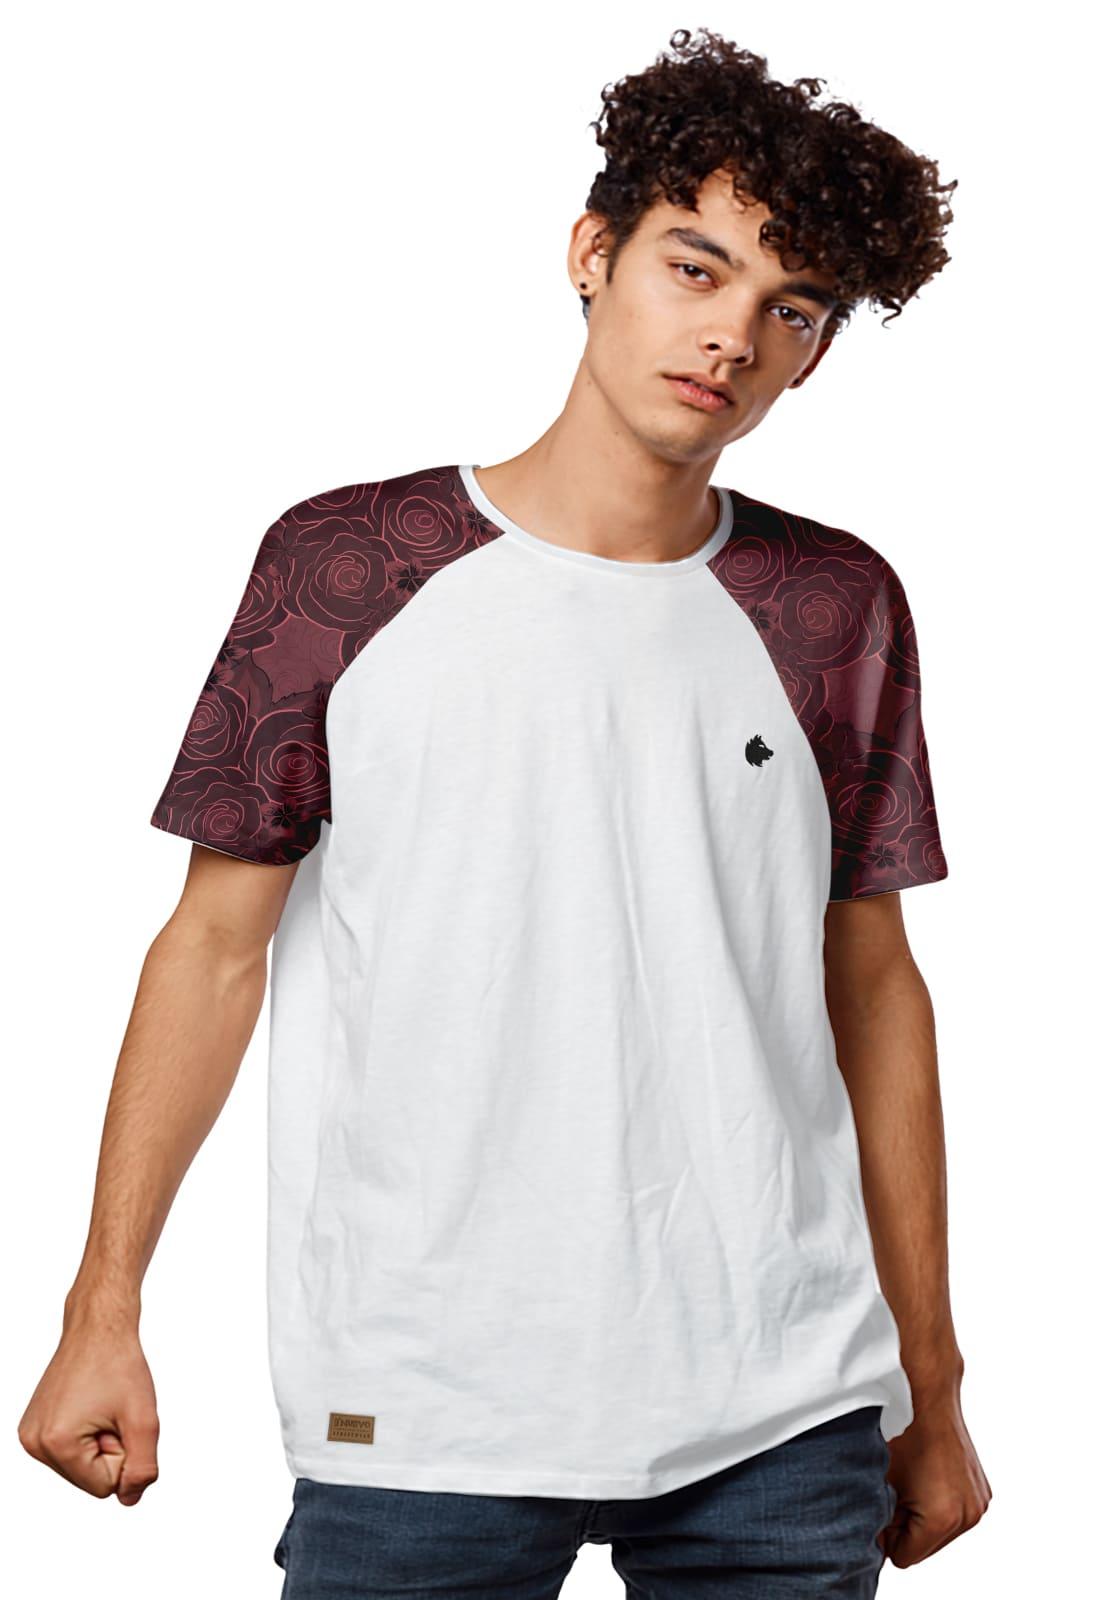 Camiseta Masculina Raglan Manga com Rosas